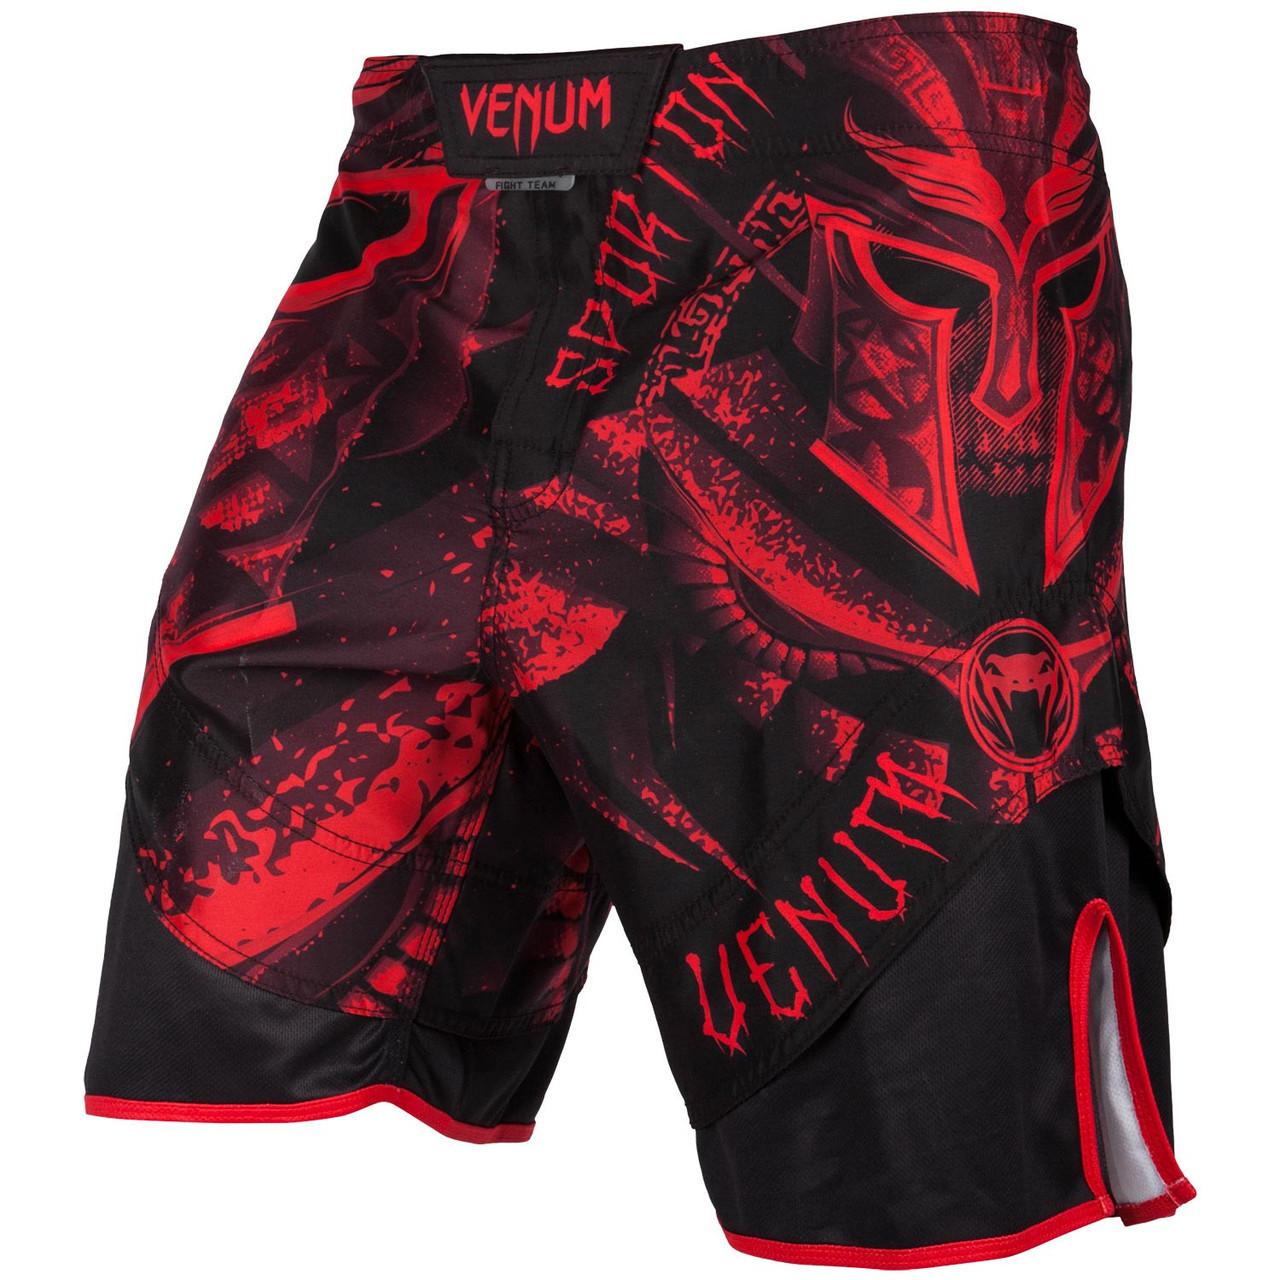 Venum Gladiator 3.0 Fight Shorts Black/Red